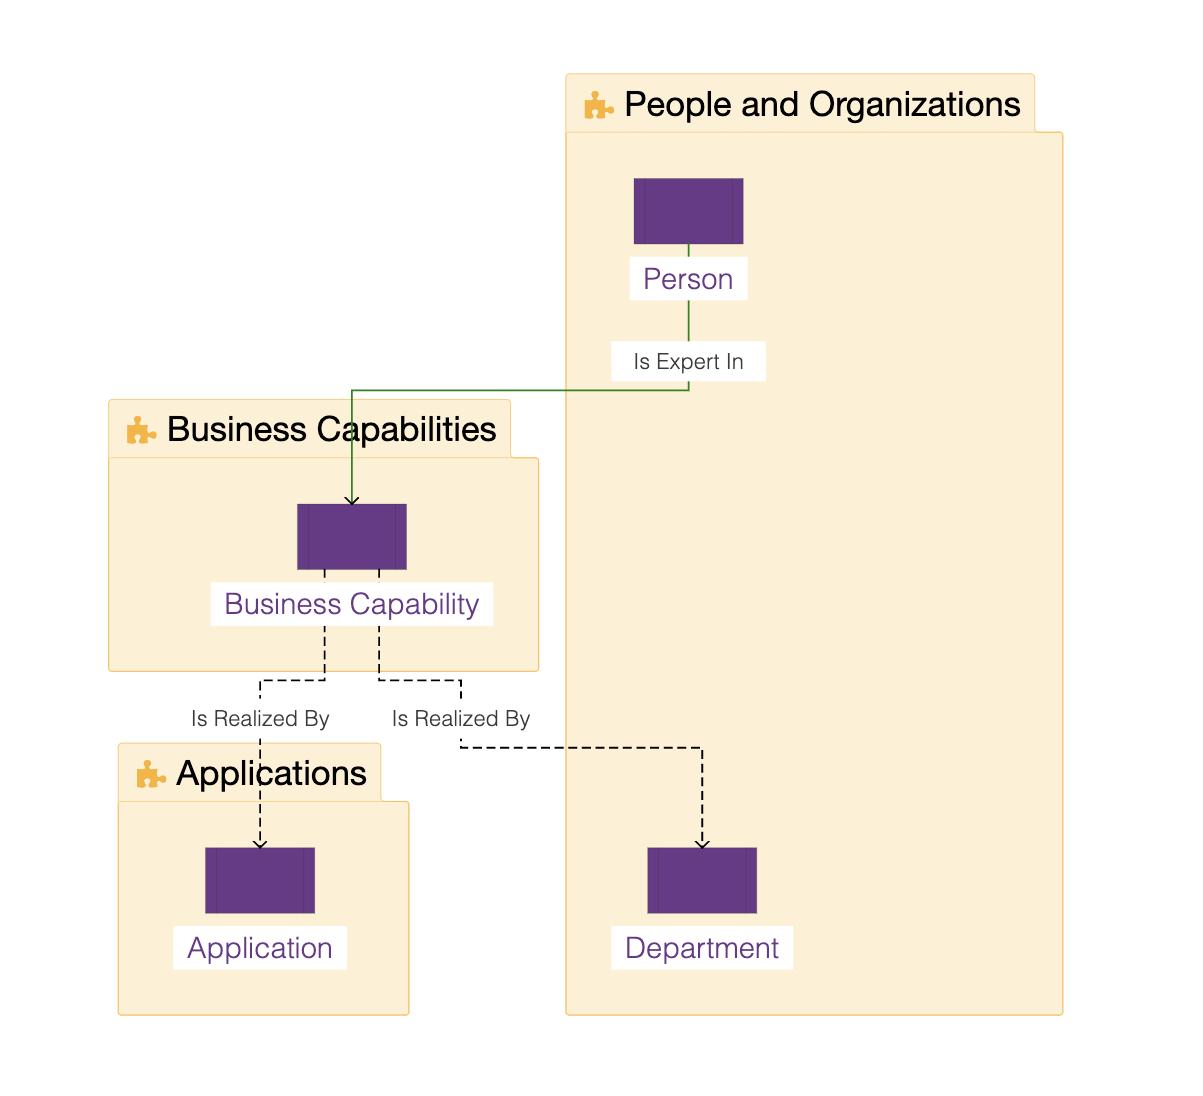 Ardoq business capability data requires